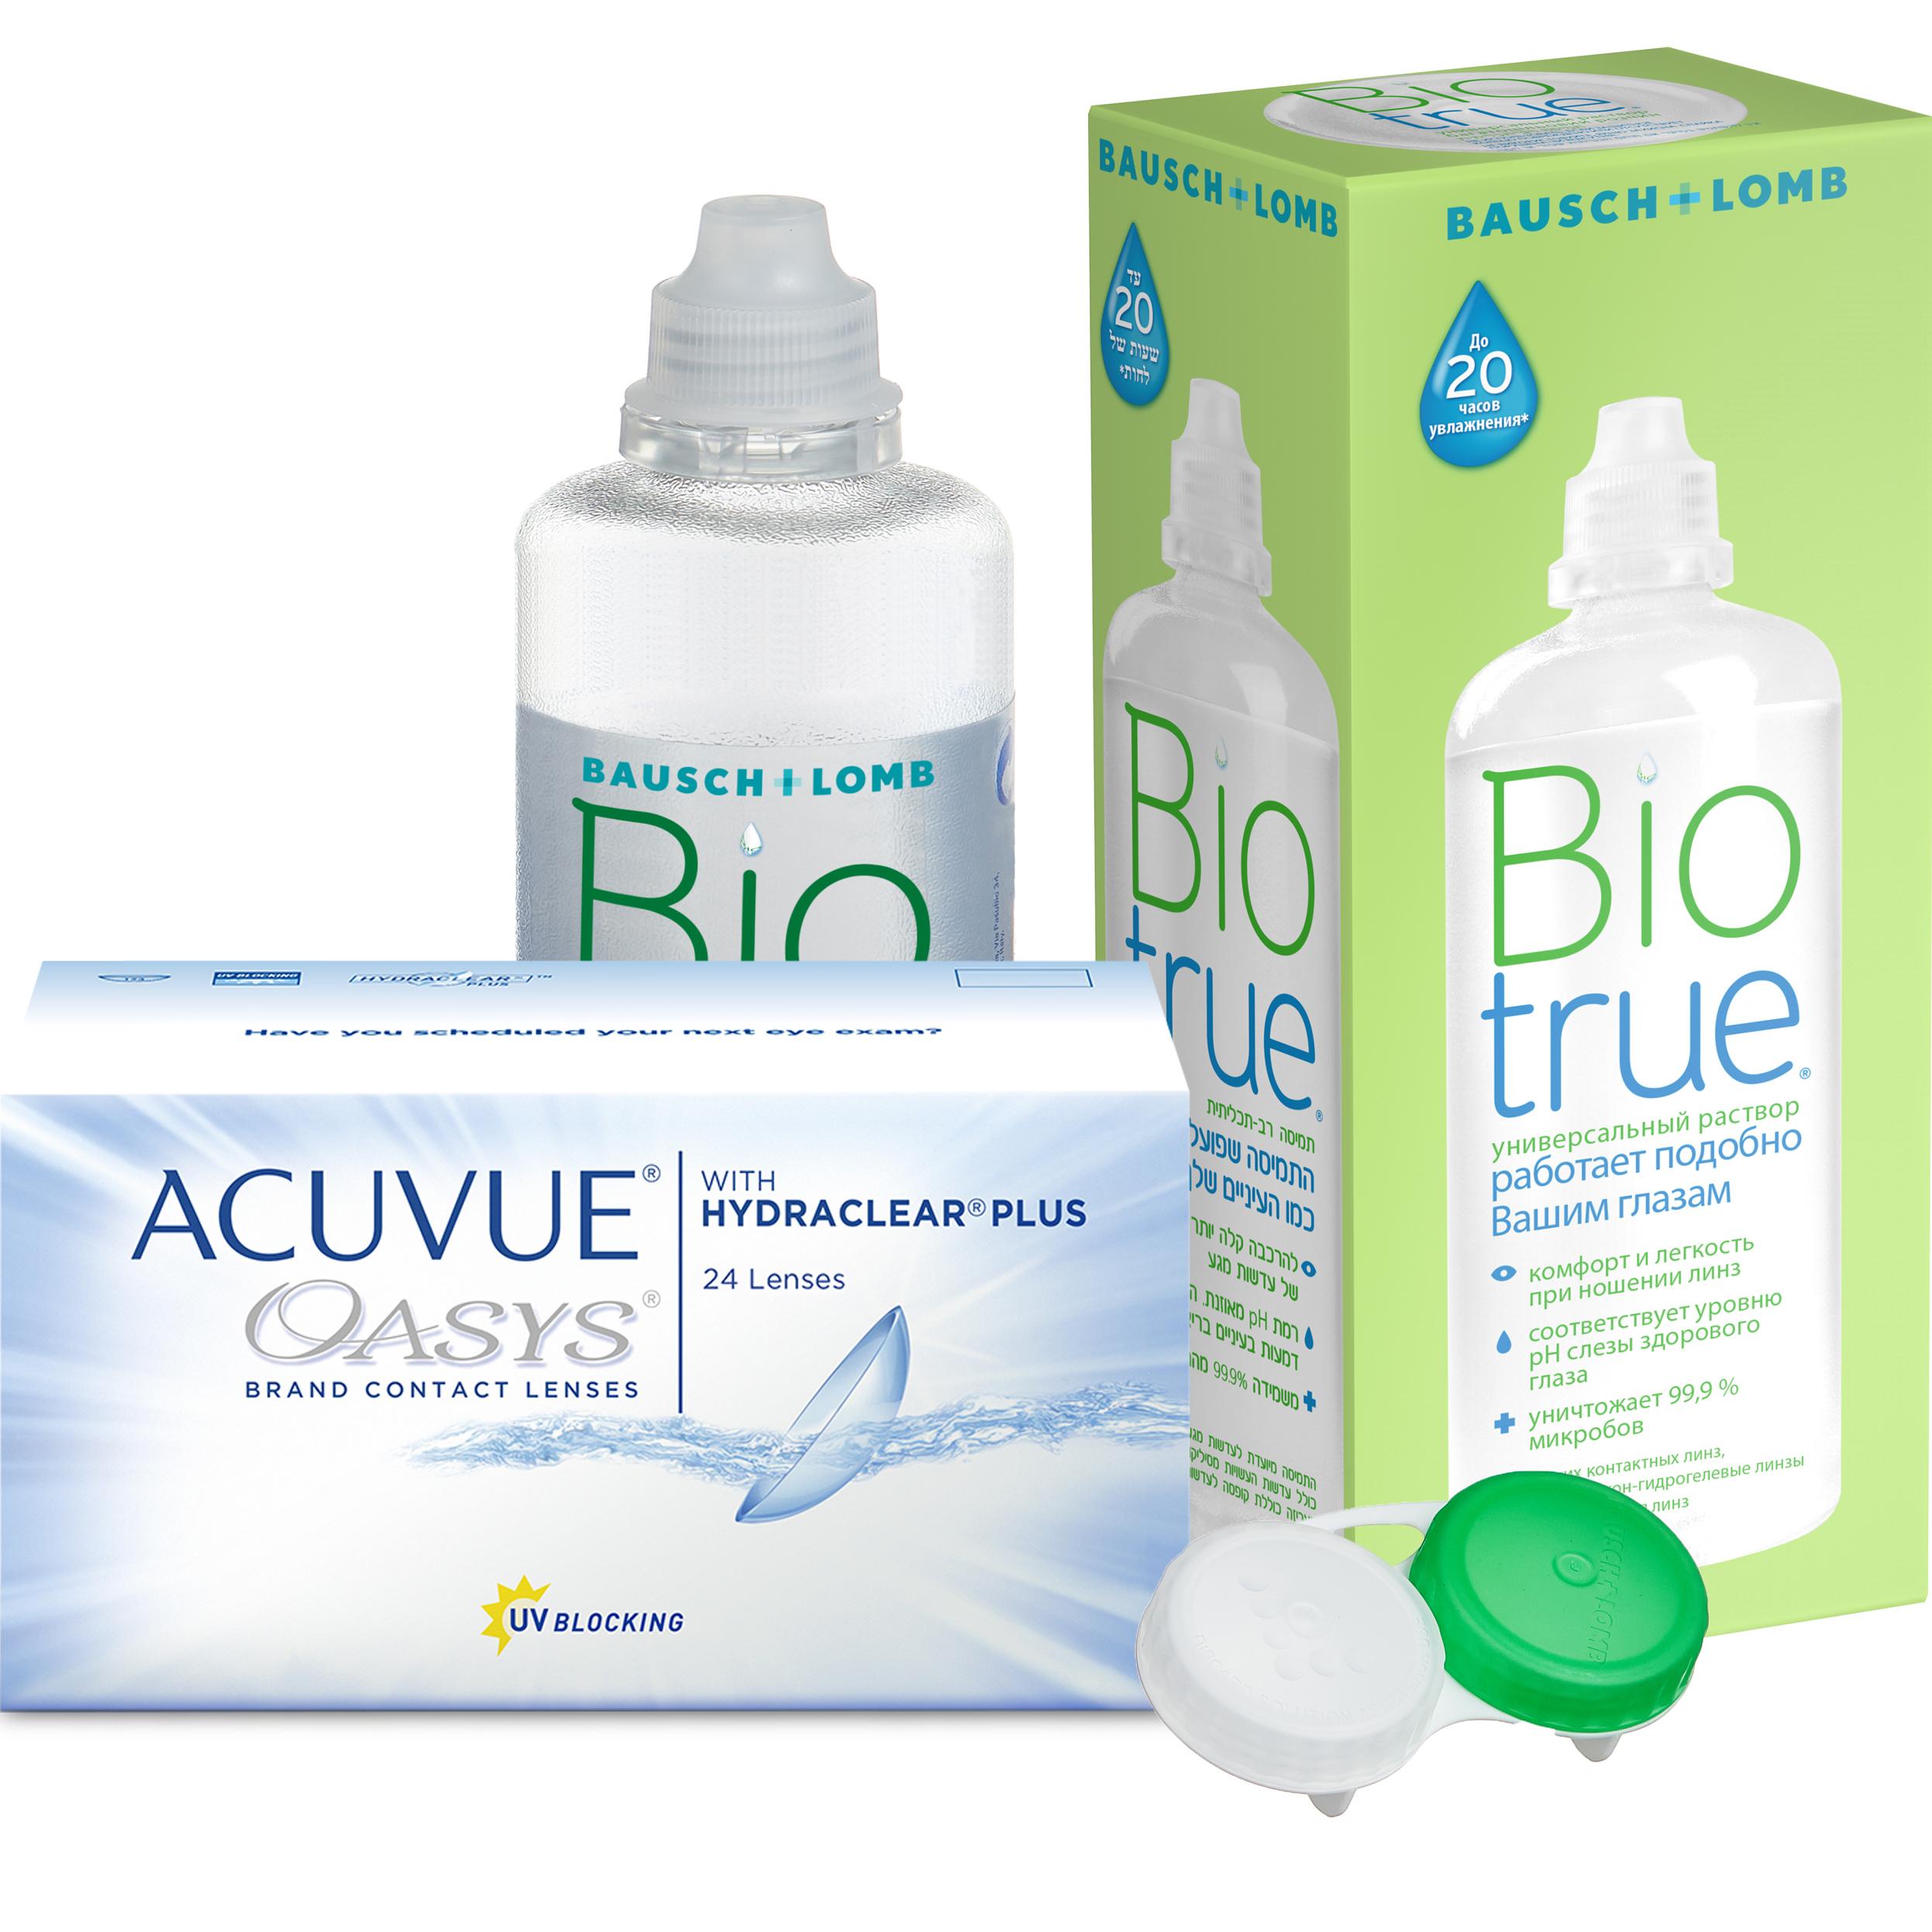 Купить Oasys with Hydraclear Plus 24 линзы + Biotrue, Контактные линзы Acuvue Oasys with Hydraclear Plus 24 линзы R 8.4 +0, 50 + Biotrue 300 мл